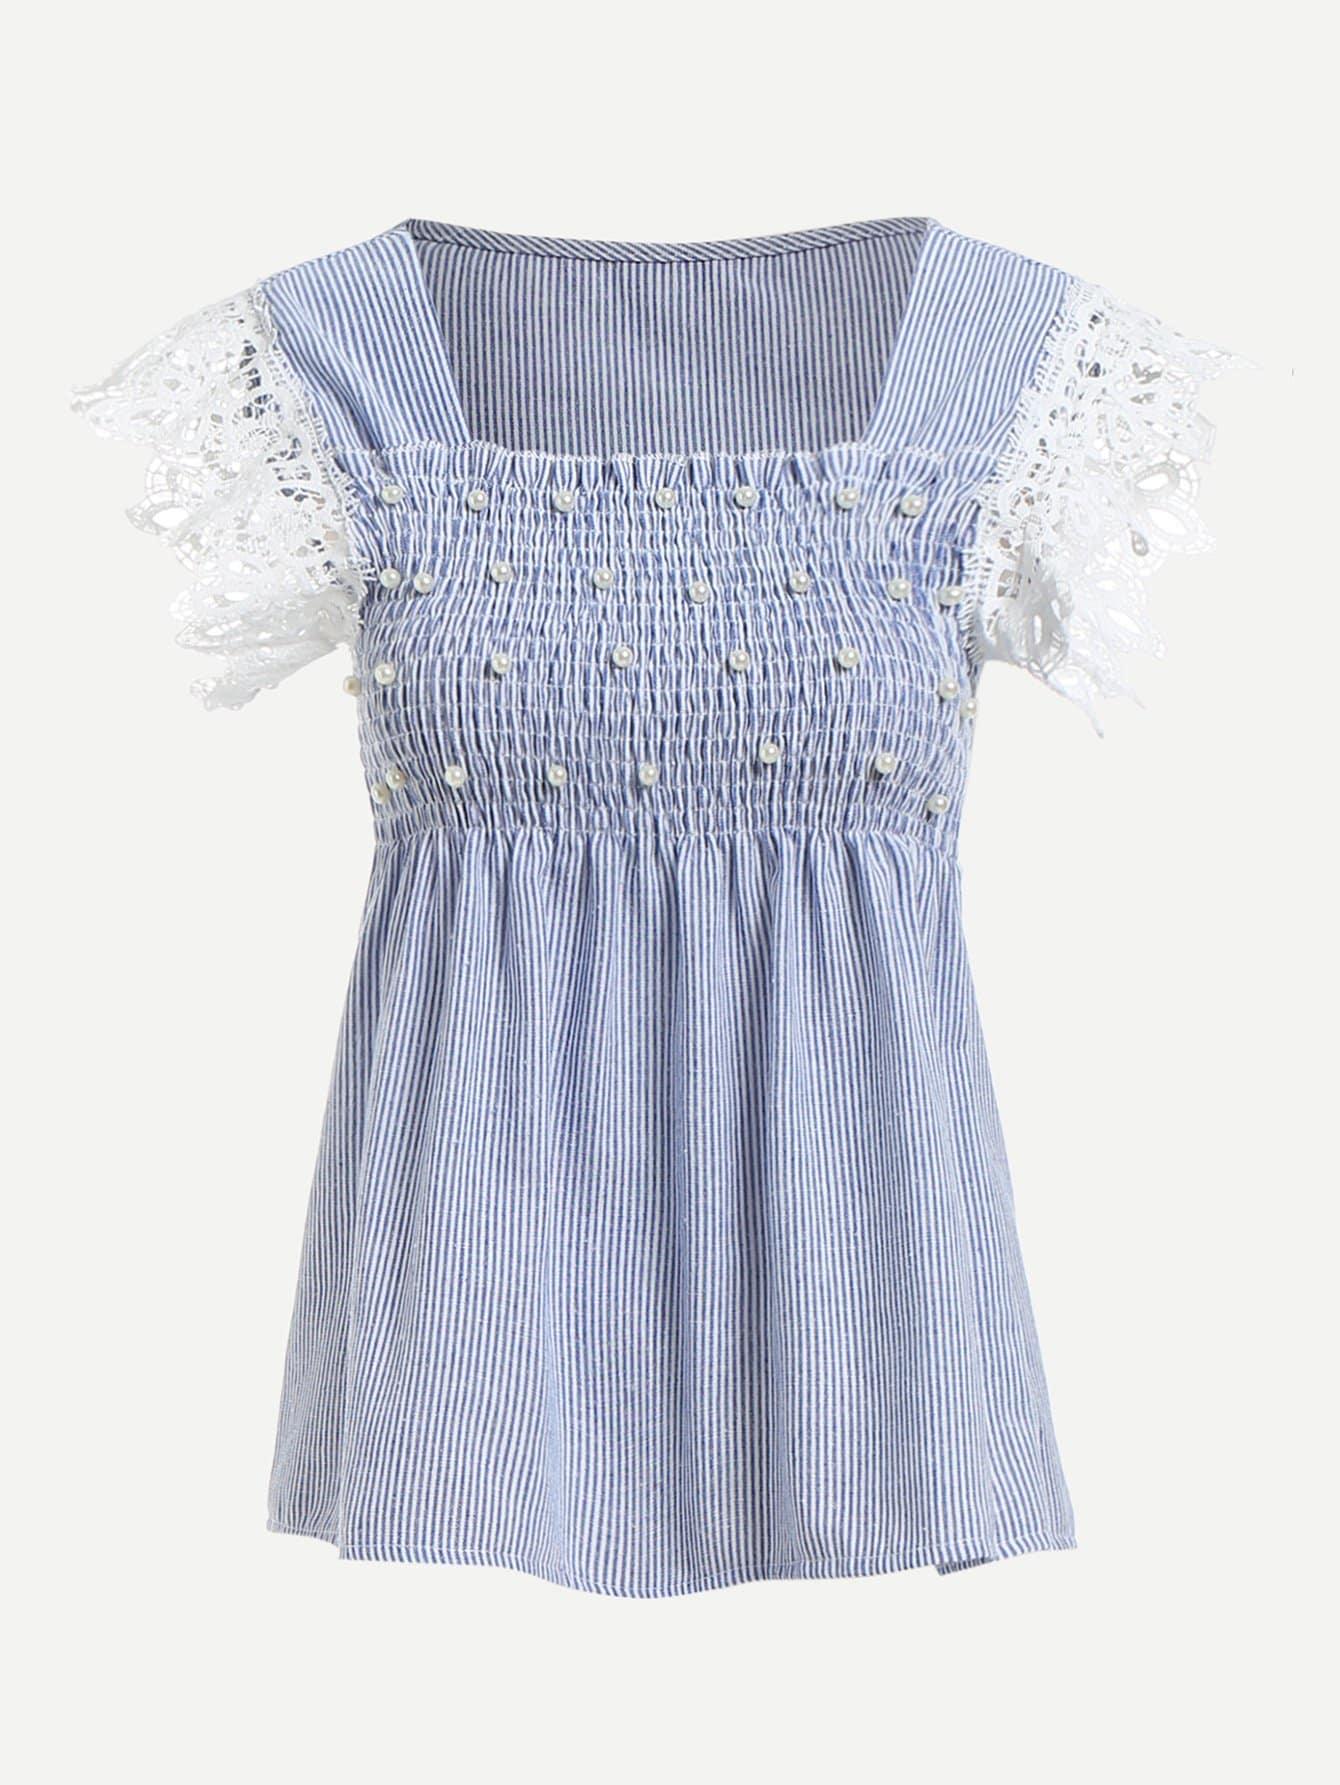 Faux Pearl Lace Crochet Contrast Stripe Blouse lace crochet contrast off shoulder stripe blouse